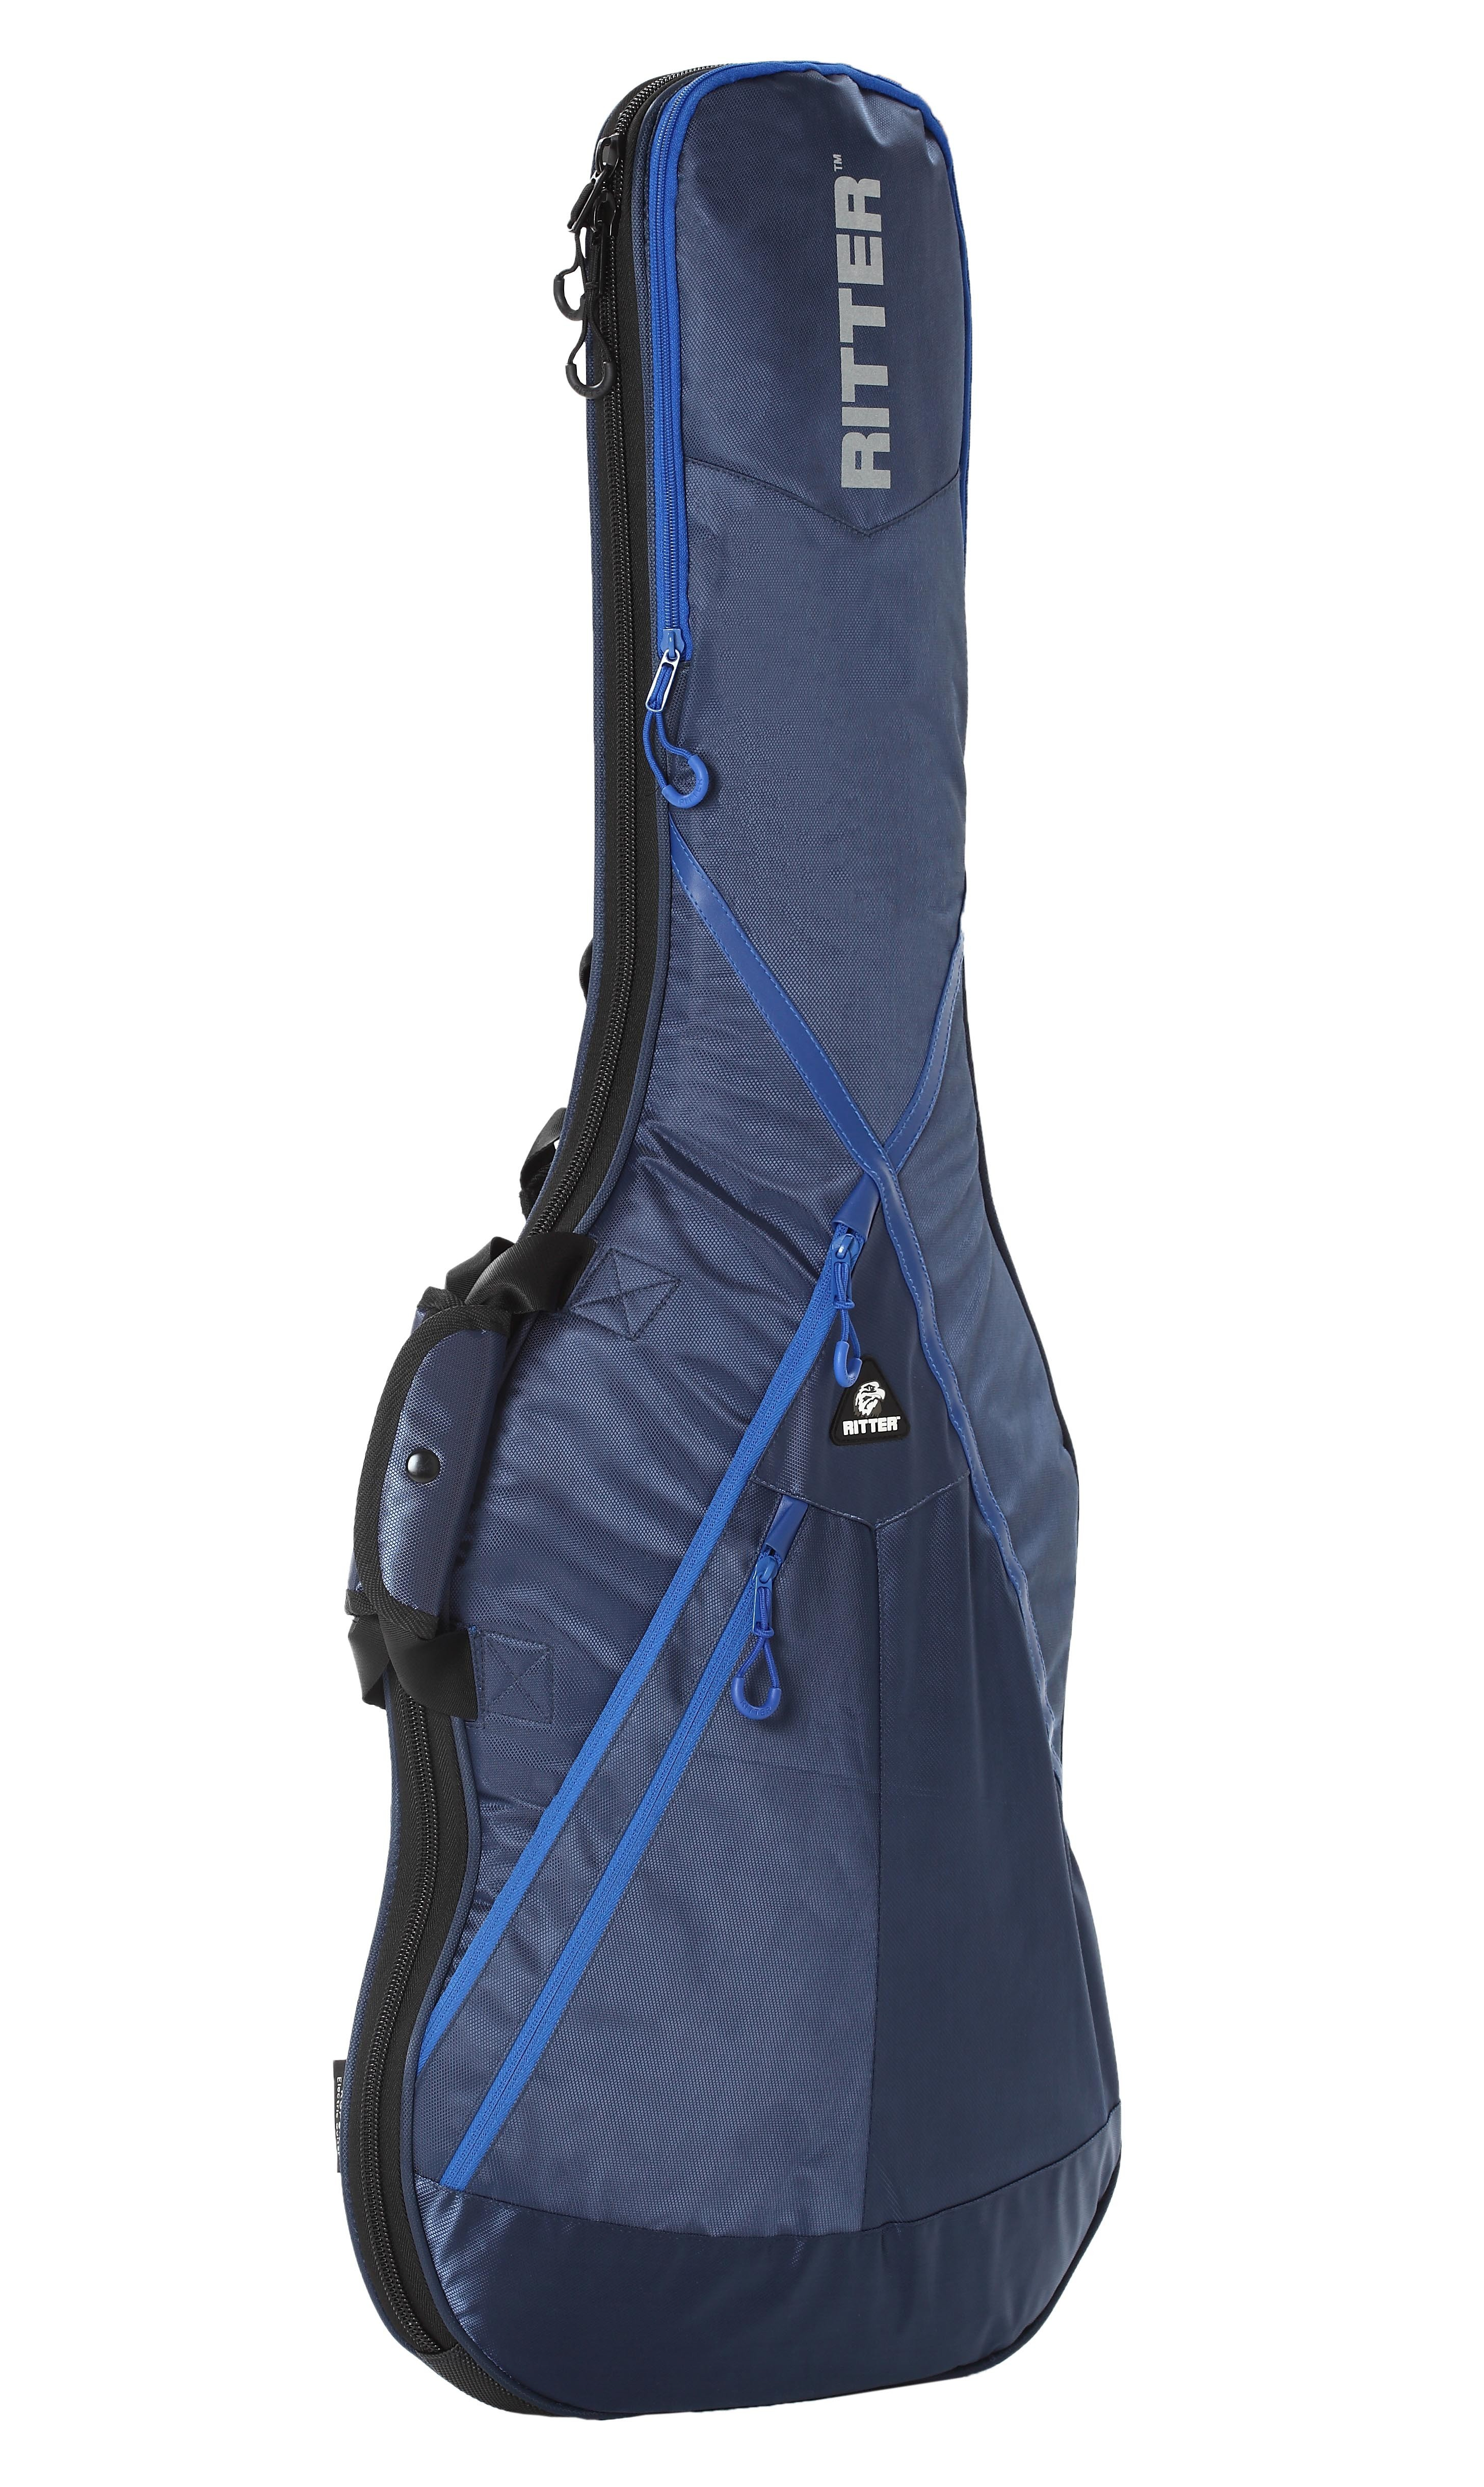 Ritter RGP8-E/NRB Electric Guitar Bag - Navy/Blue